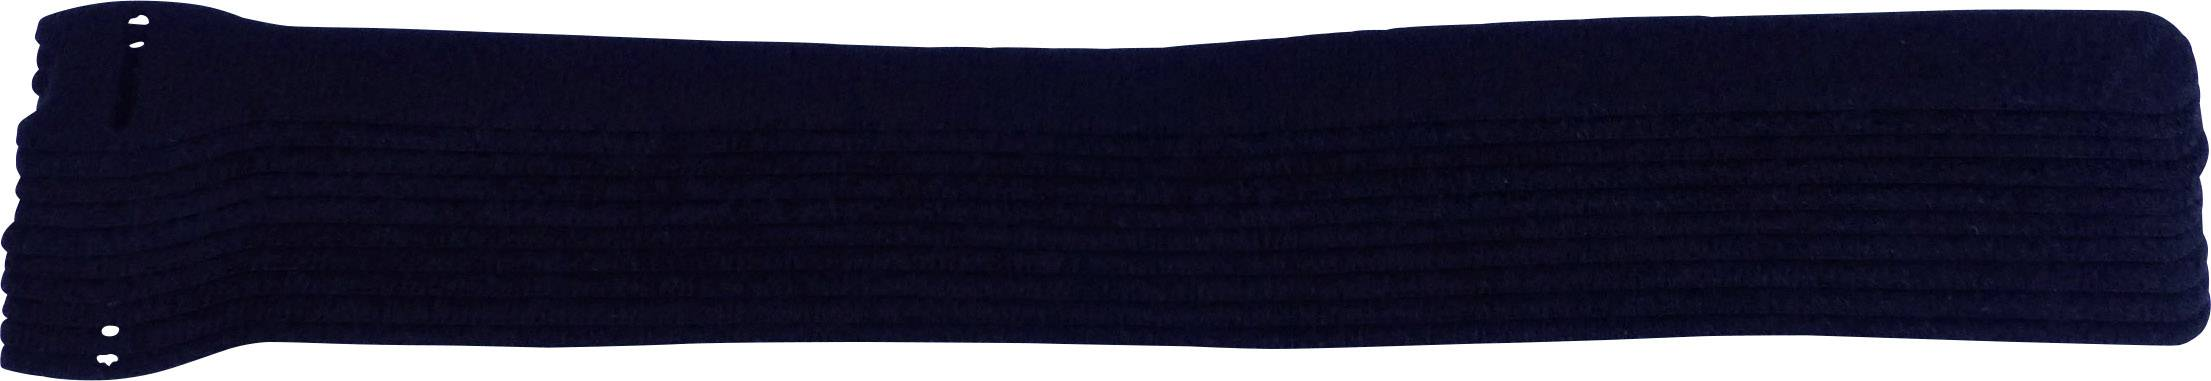 Káblový manažér na suchý zips TRU COMPONENTS 803-330-Bag, (d x š) 300 mm x 16 mm, čierna, 10 ks